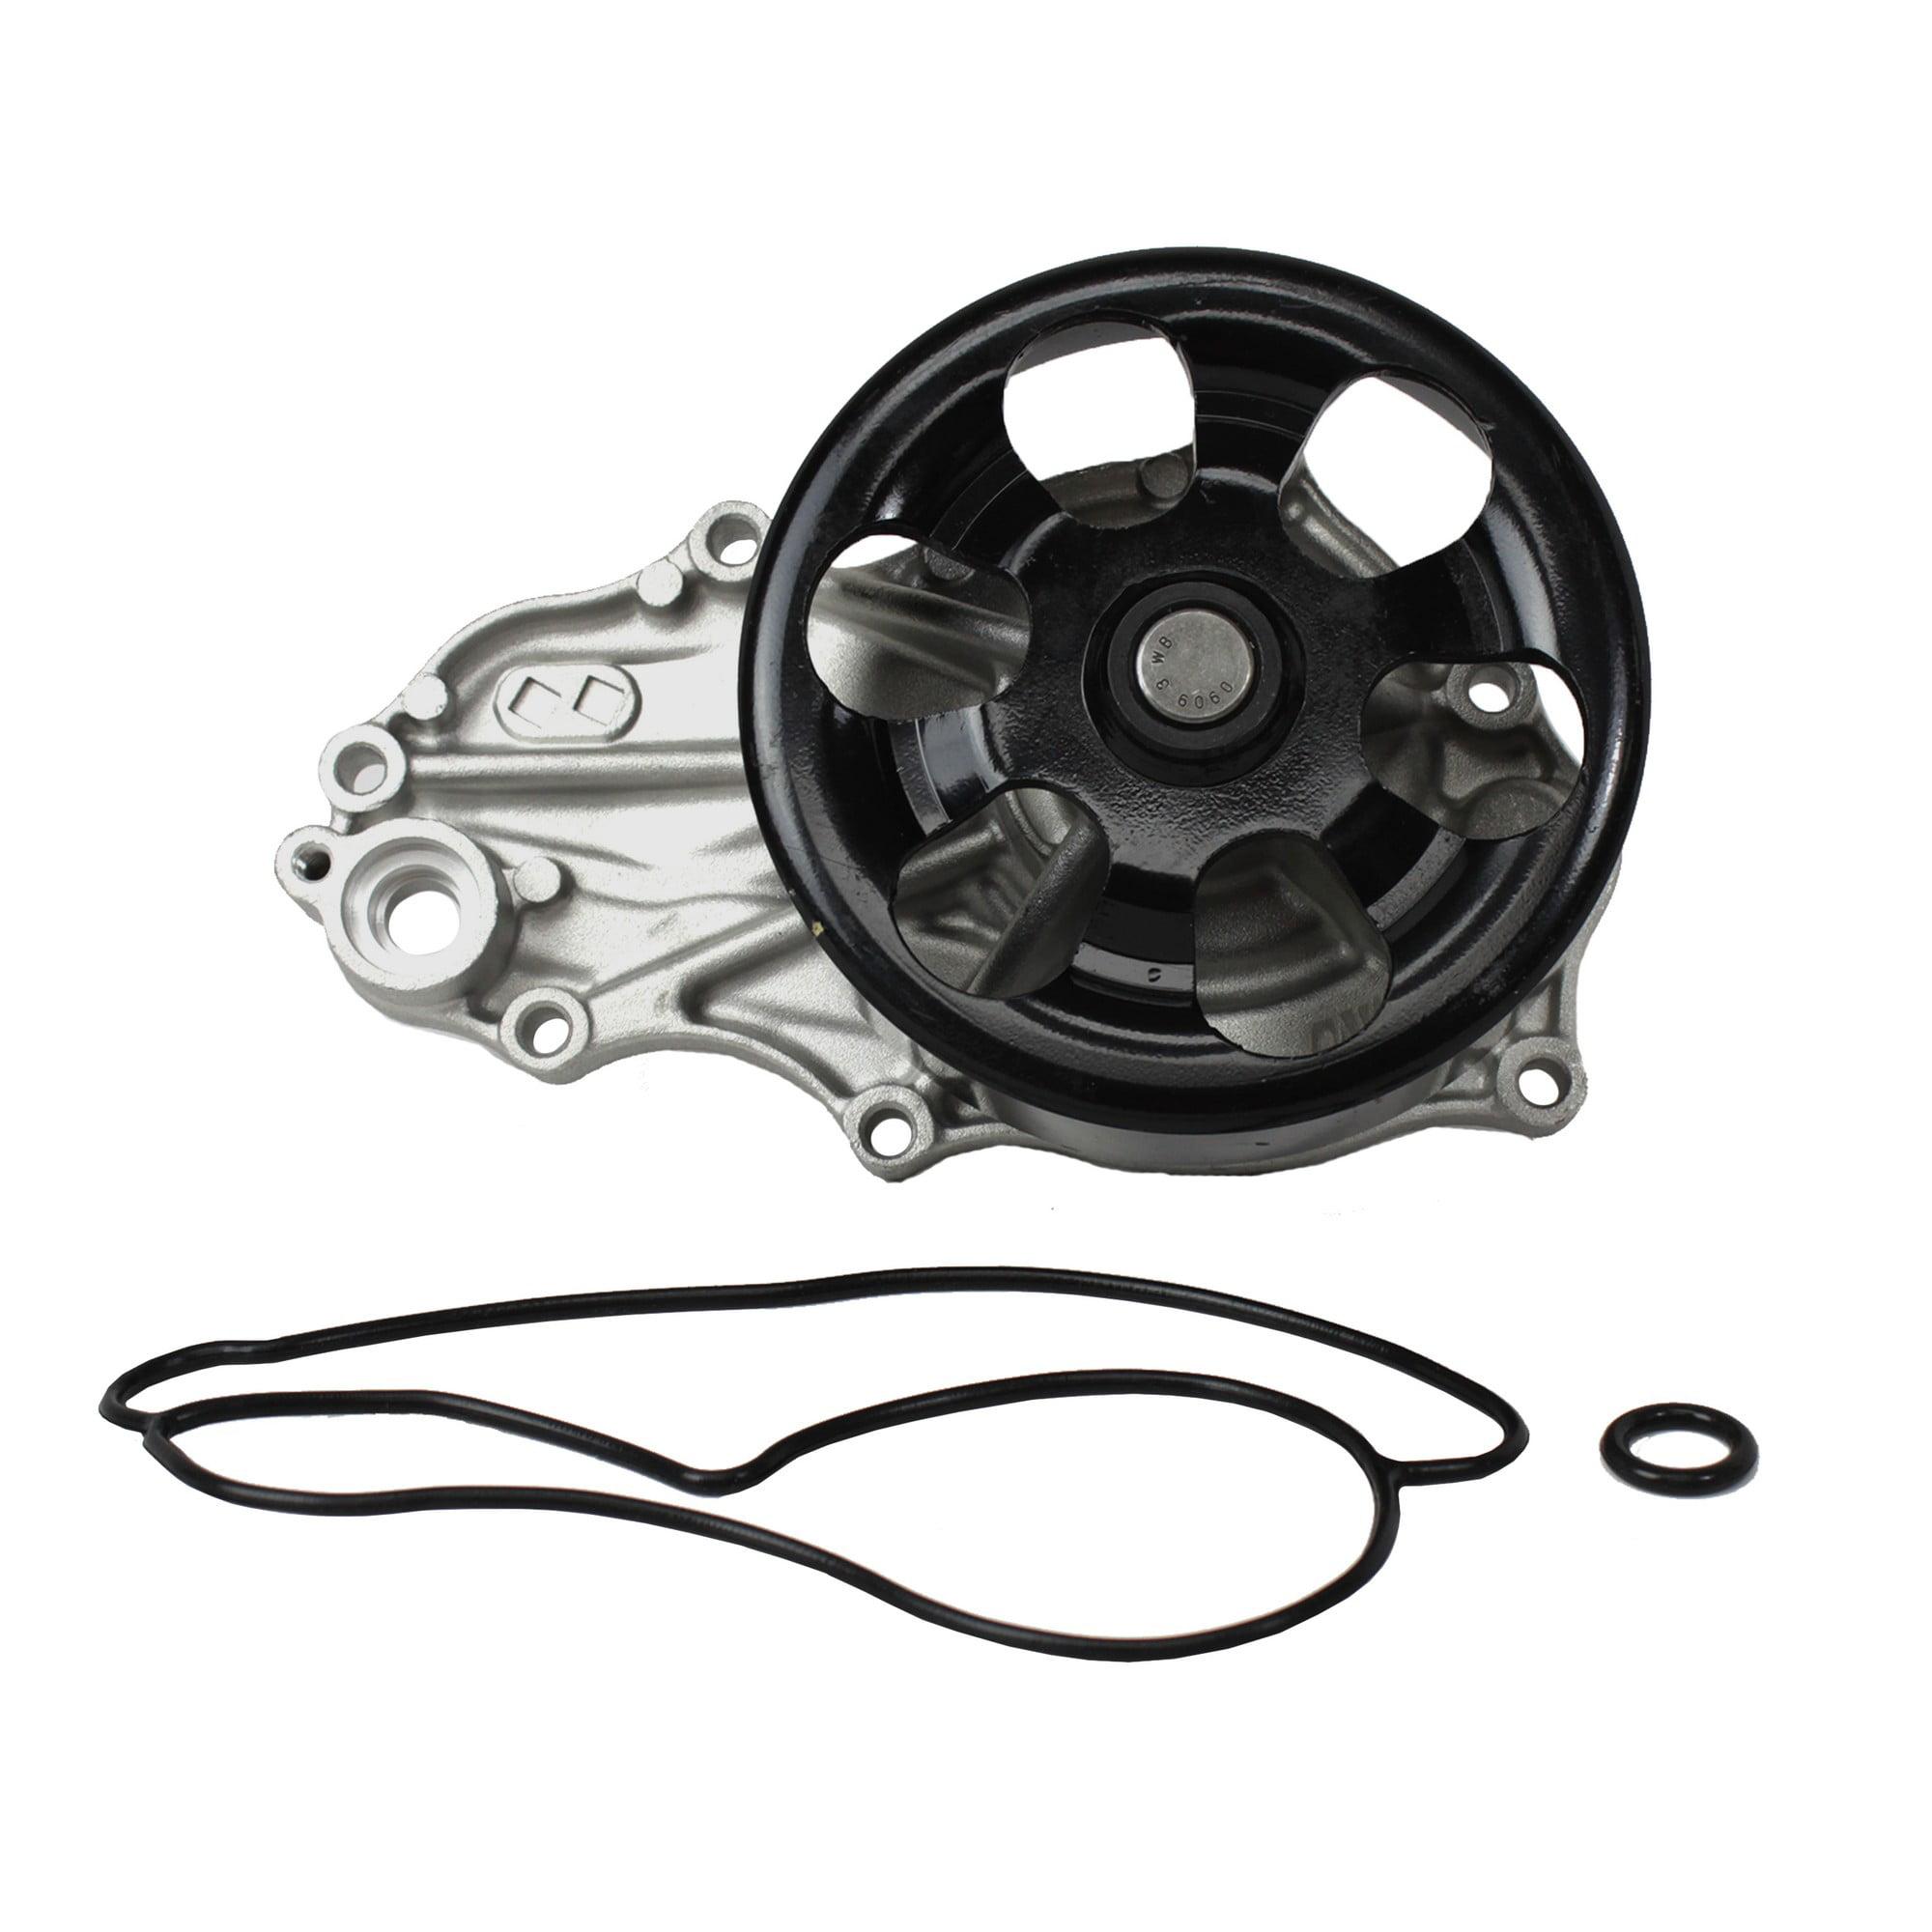 DNJ WP218A Water Pump For 02-06 Acura RSX 2.0L L4 DOHC